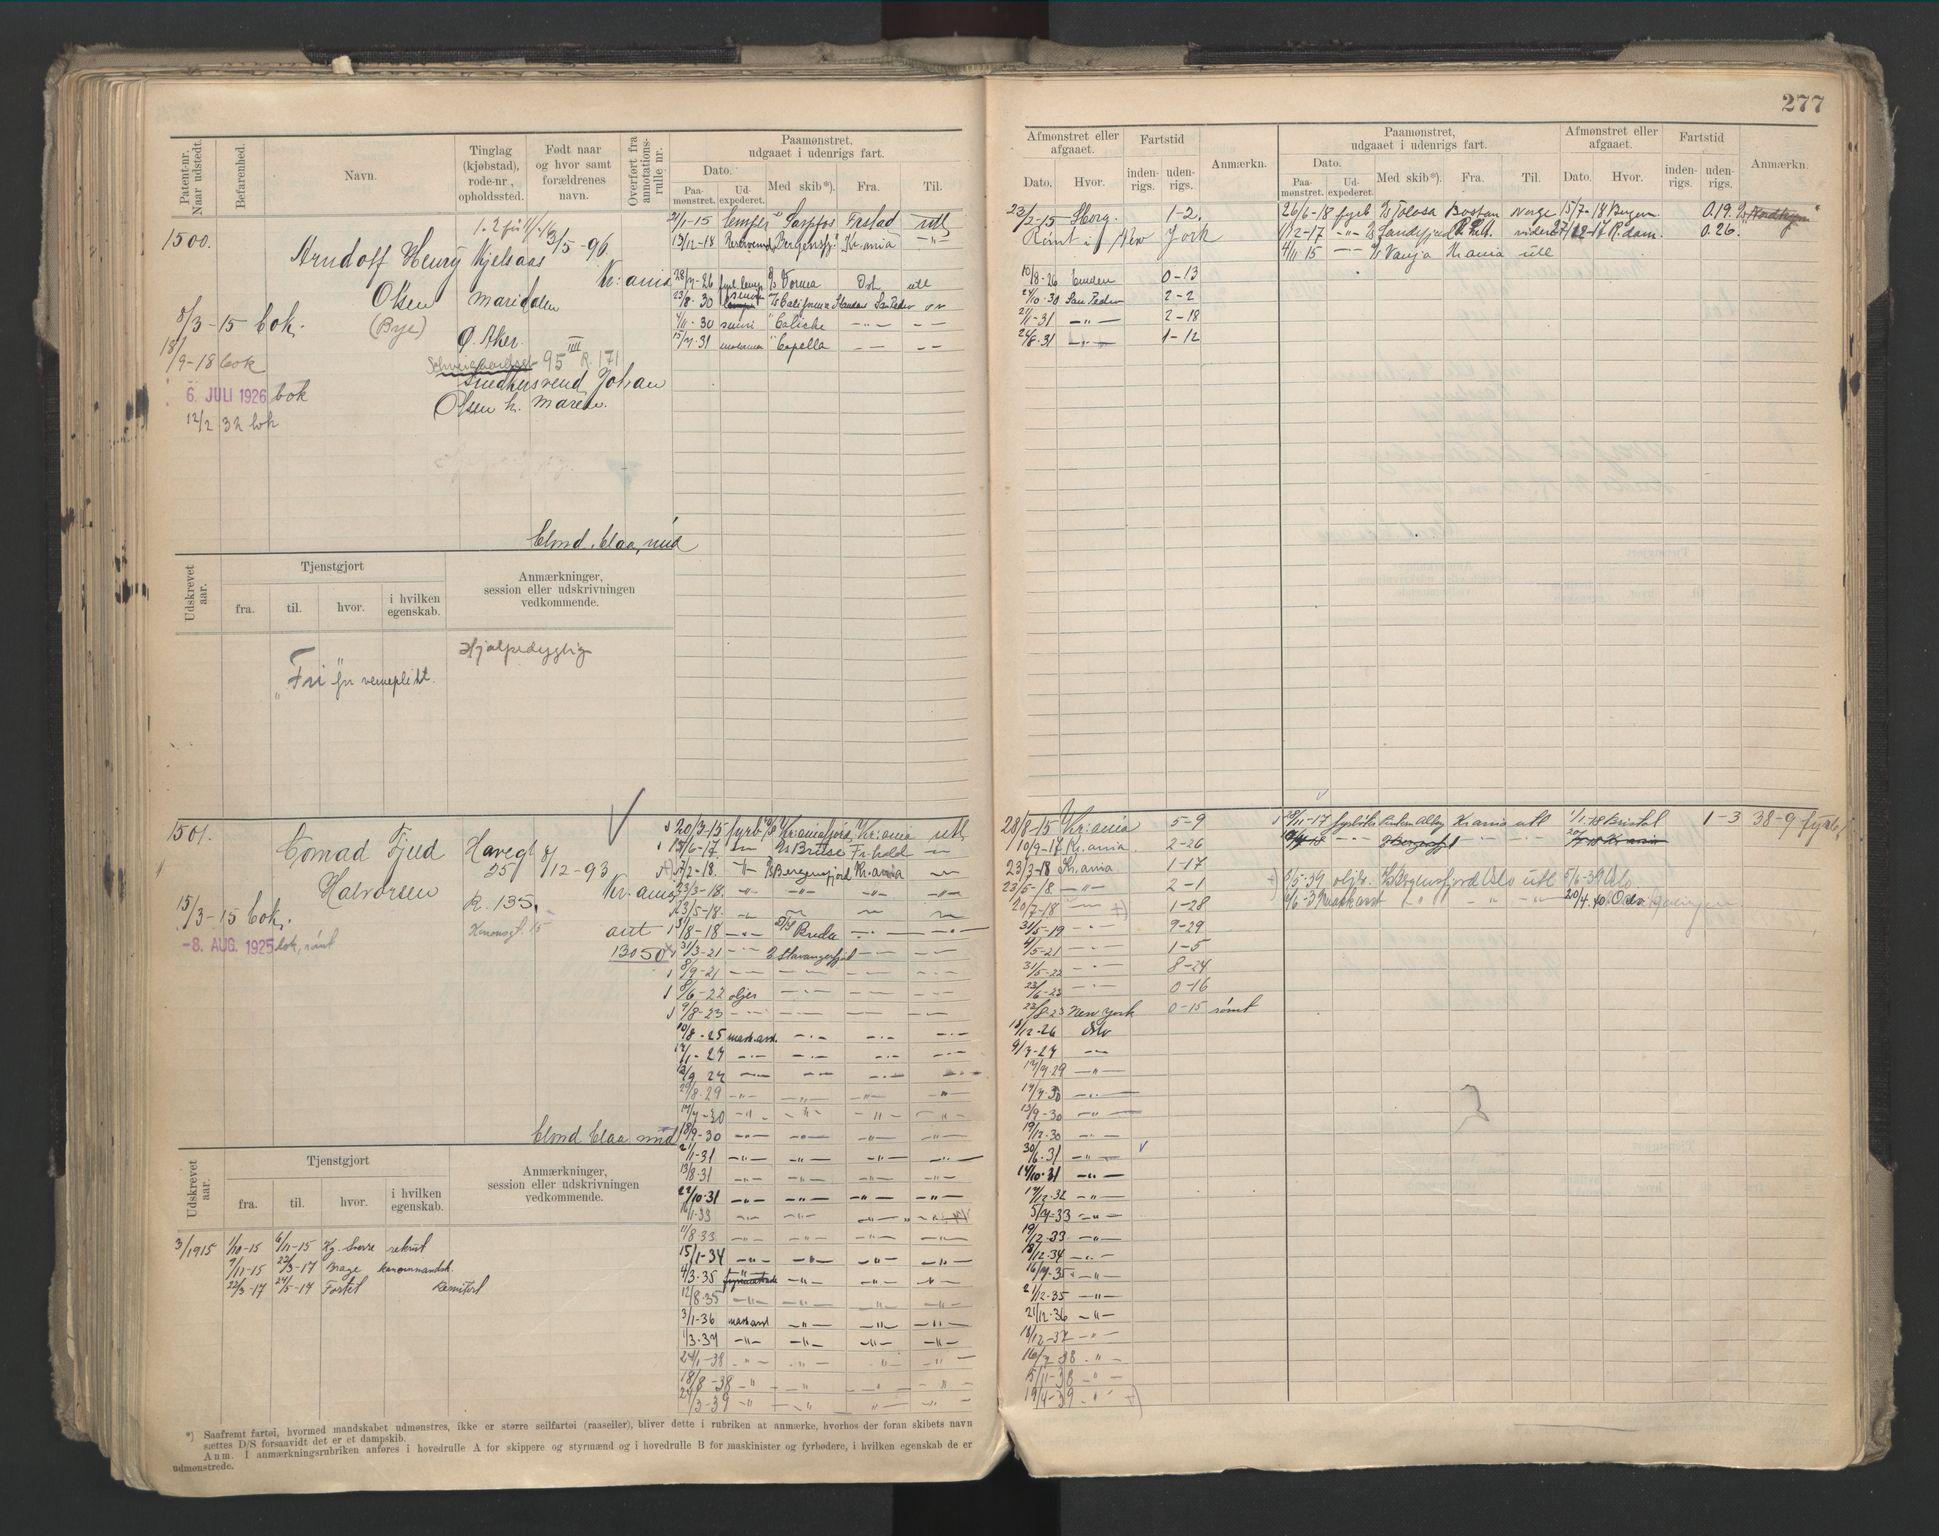 SAO, Oslo sjømannskontor, F/Fd/L0002: B-rulle, 1906-1916, s. 276b-277a